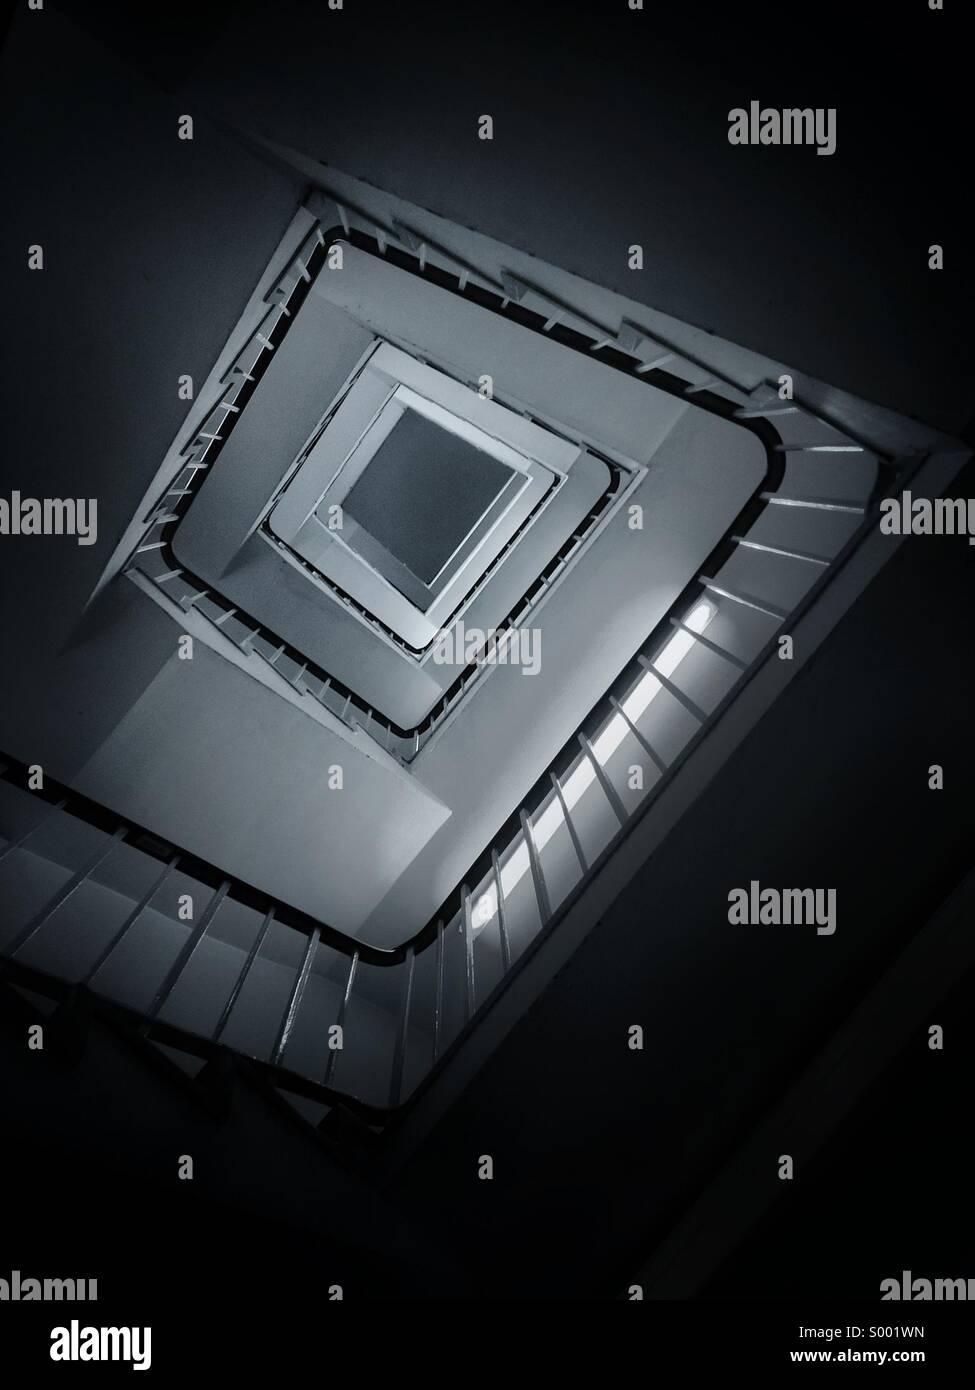 Vista astratta di scale a spirale. Immagini Stock